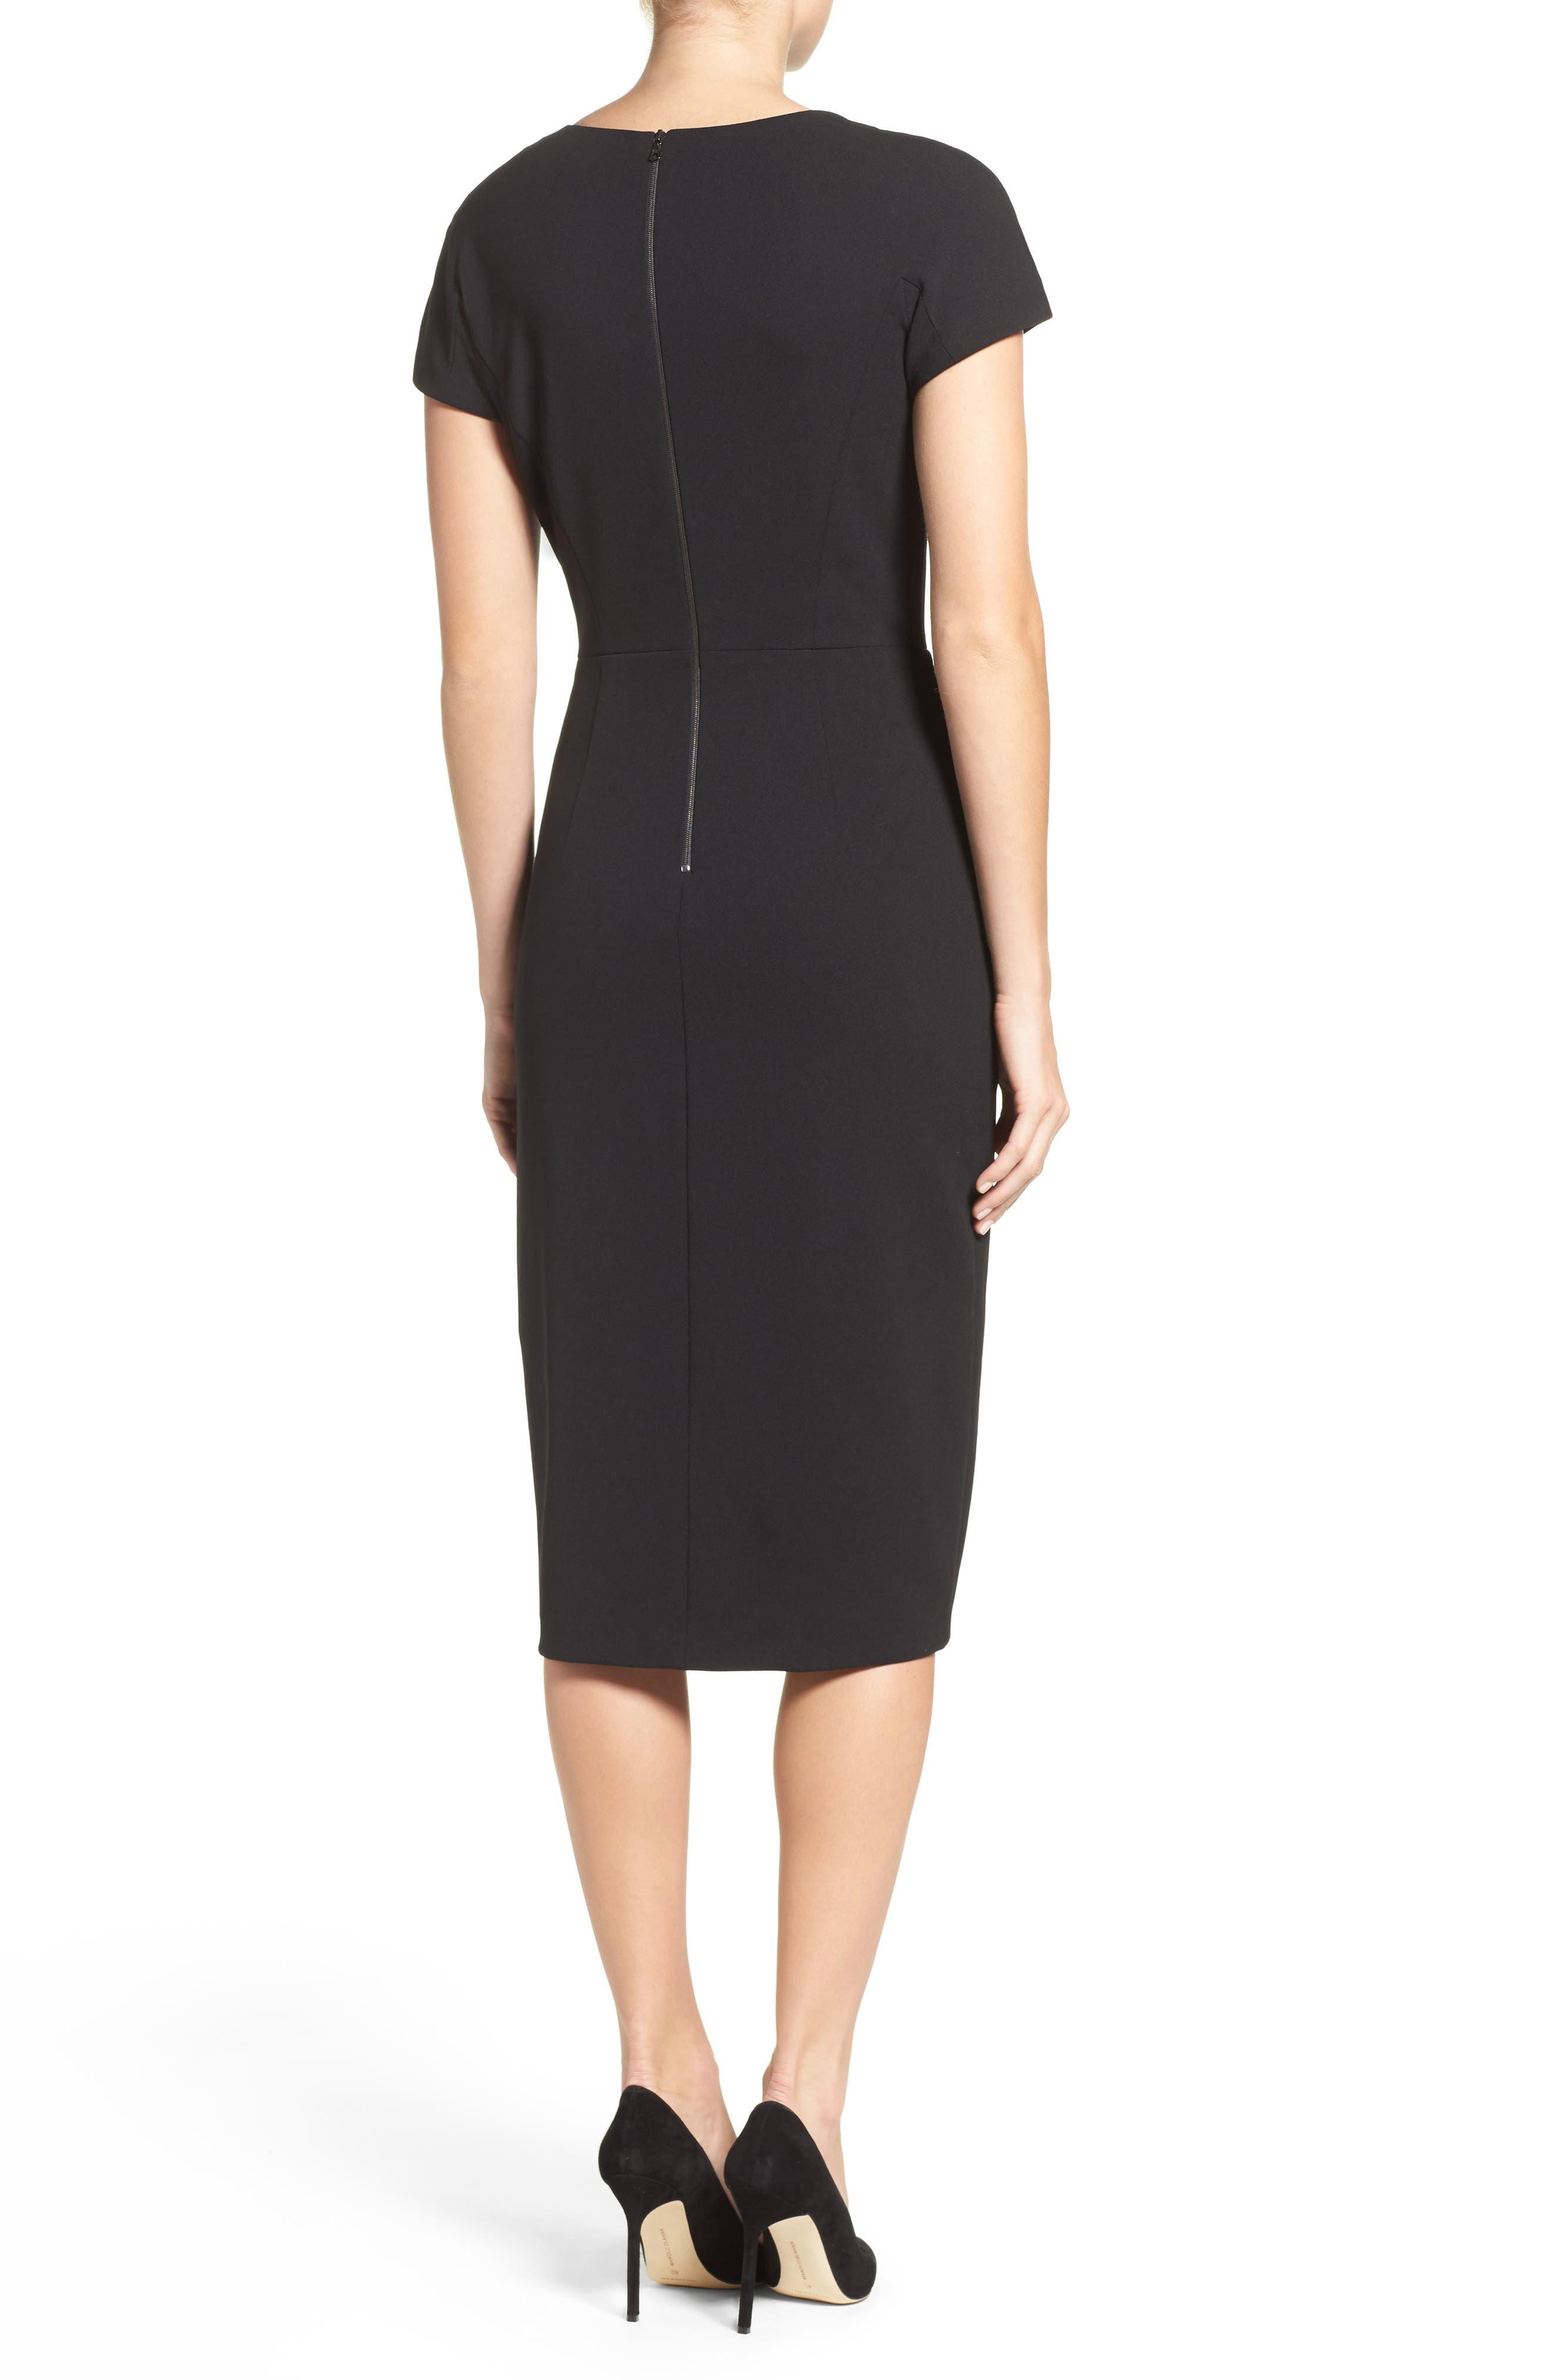 MAGGY LONDON, Asymmetrical Sheath Dress, Alternate thumbnail 2, color, 001